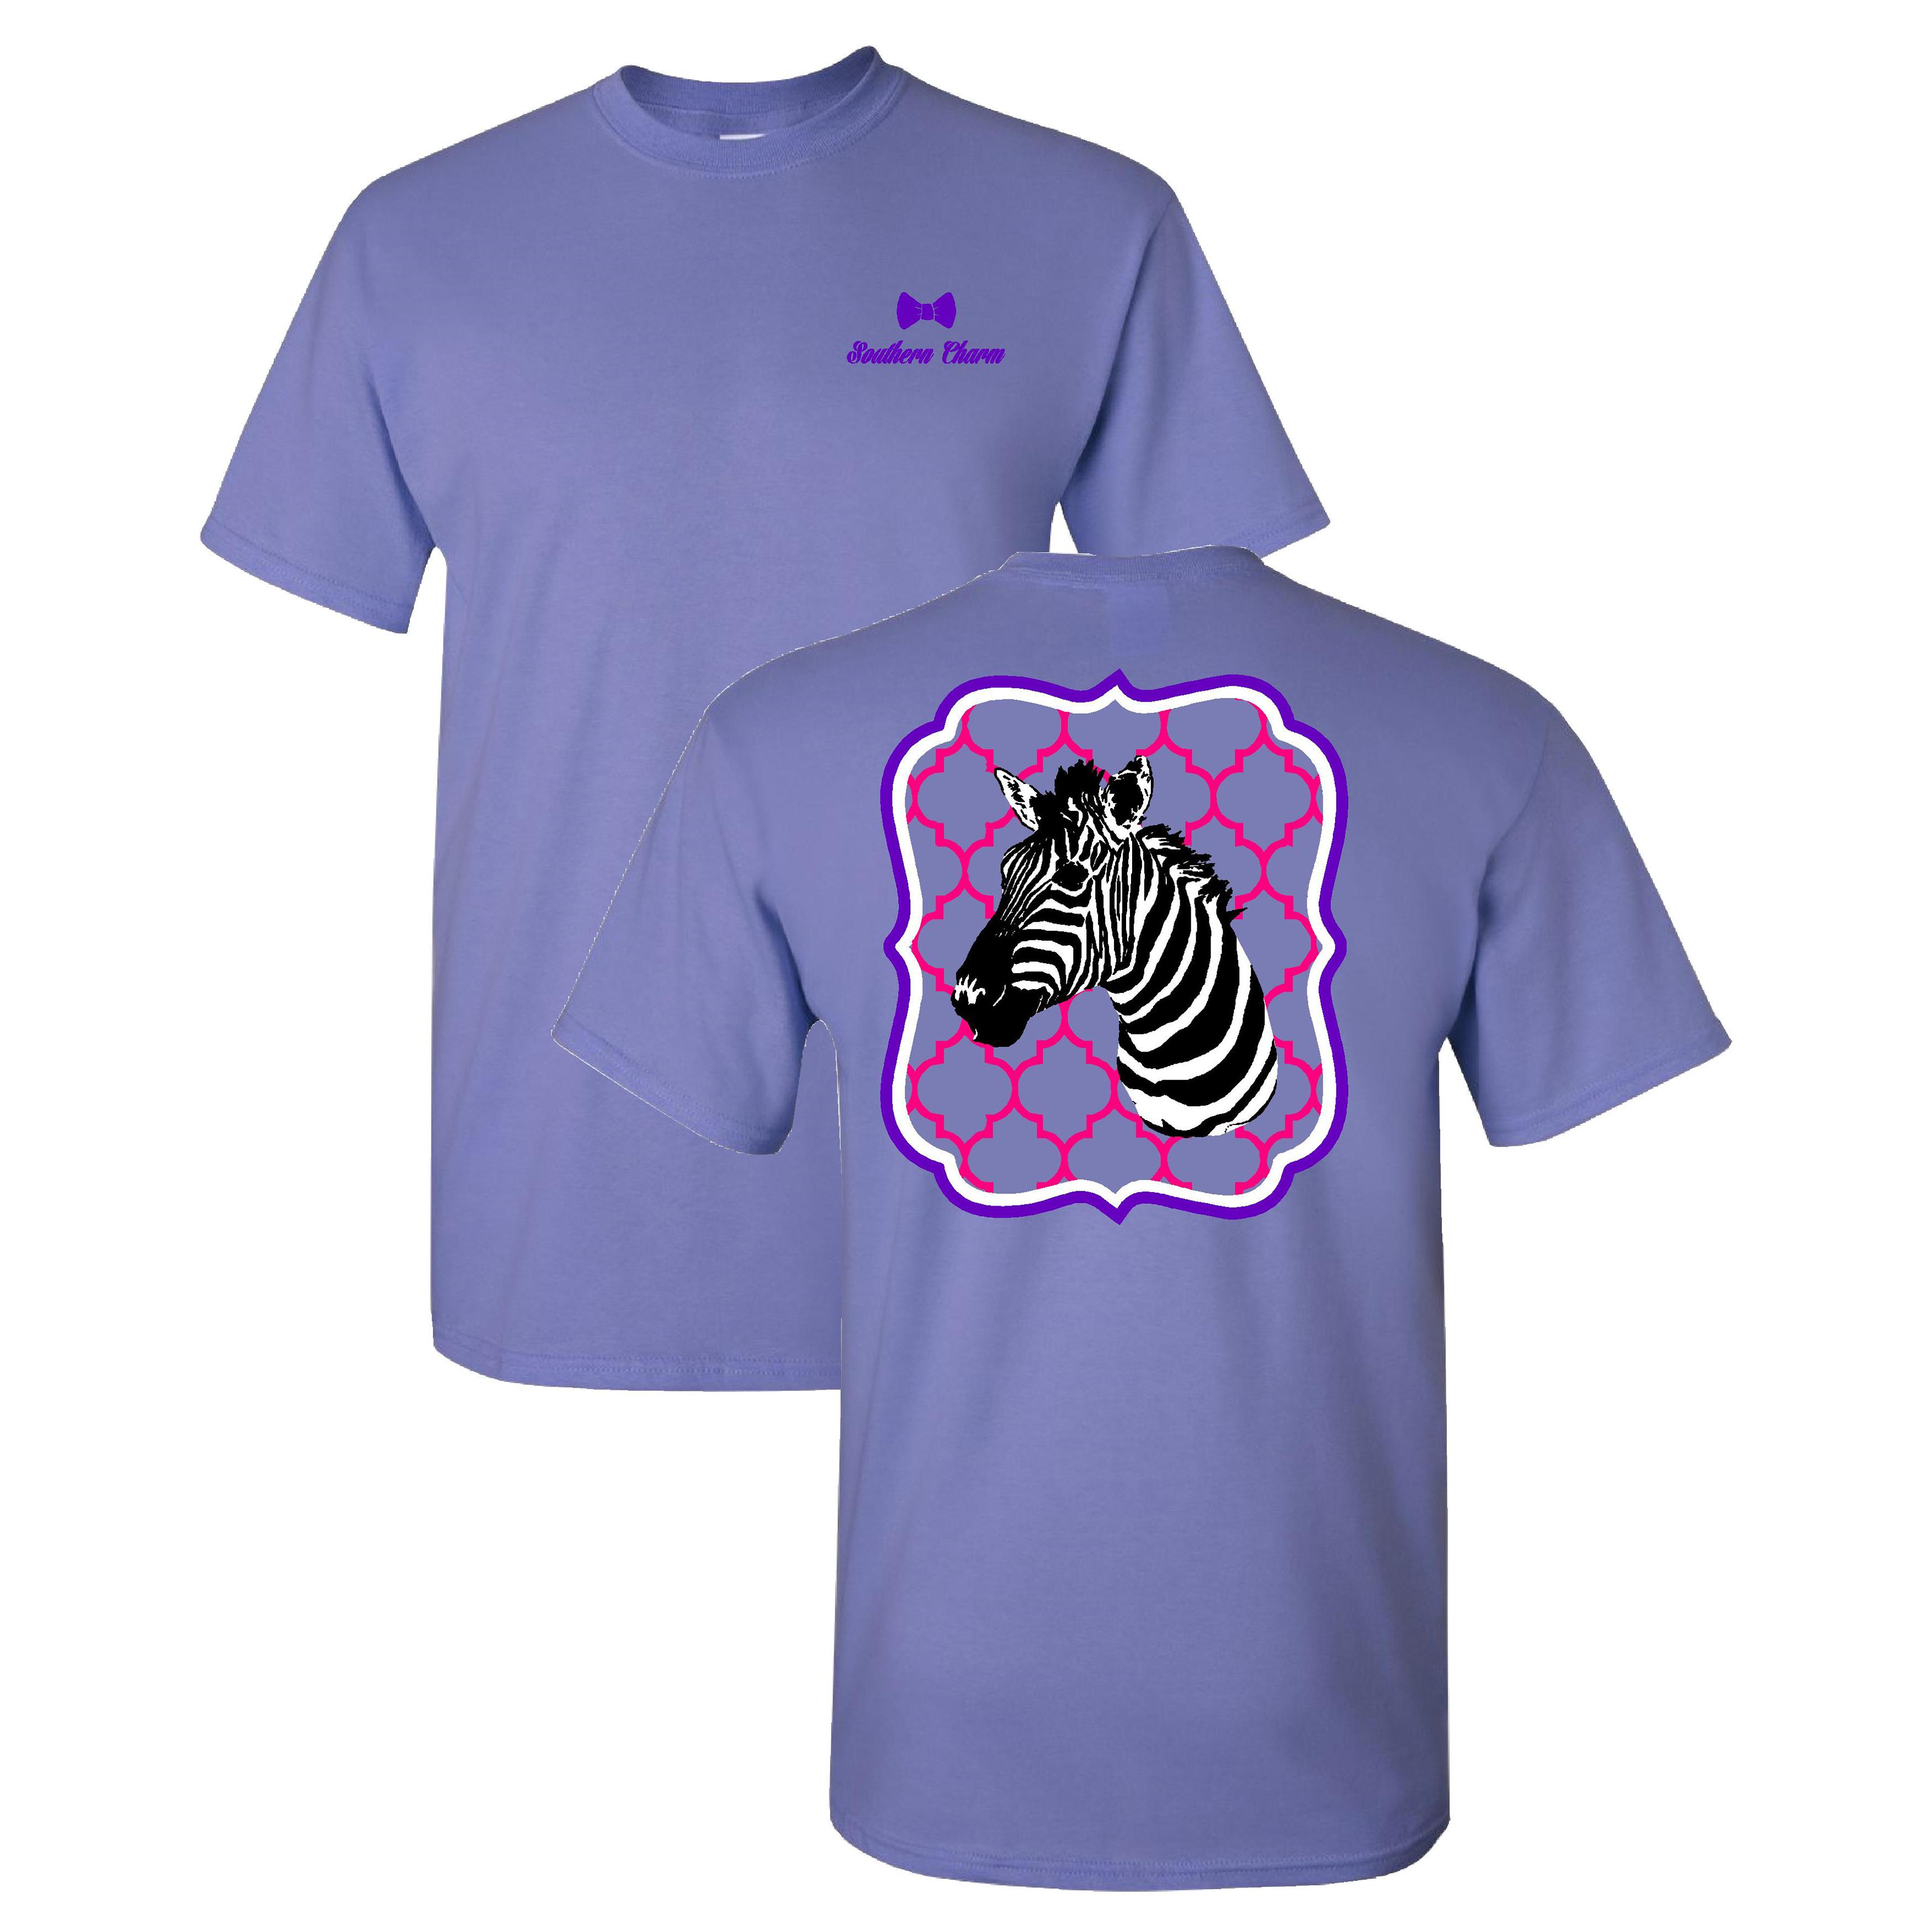 Southern-Charm-Zebra-on-a-Violet-Short-Sleeve-T-Shirt thumbnail 9